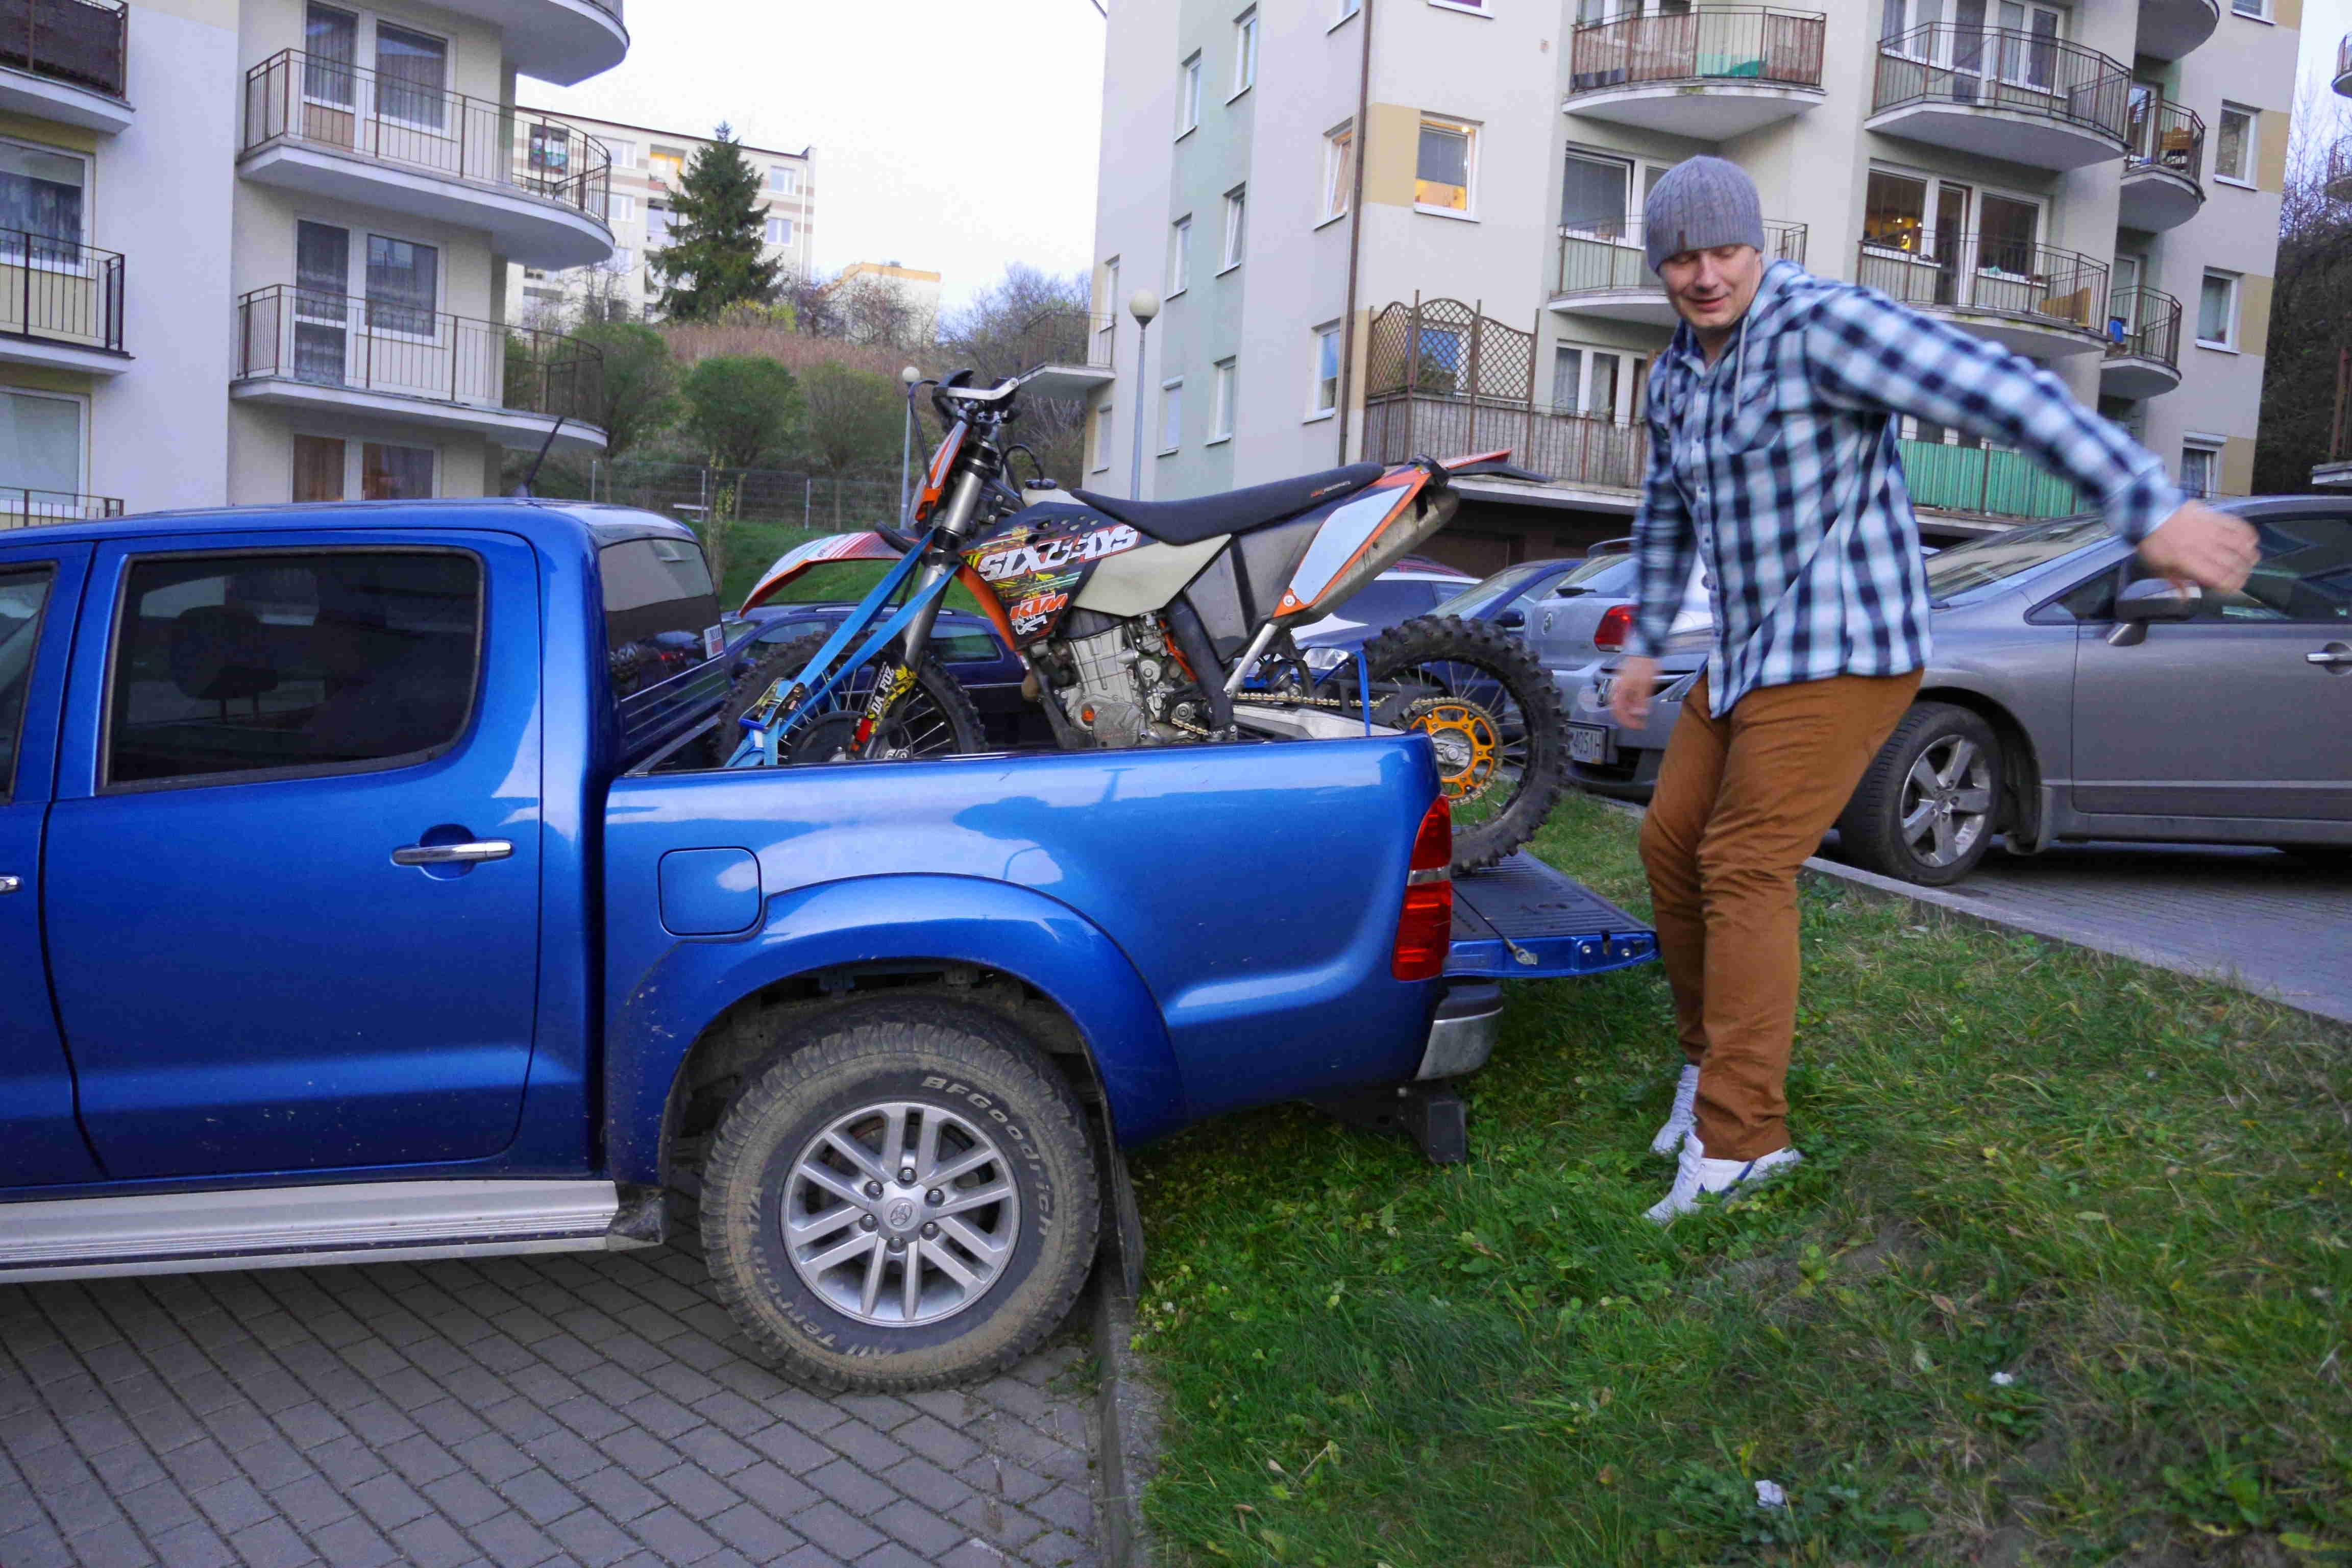 Najazd czyli rampa by MadeinEnduro :)